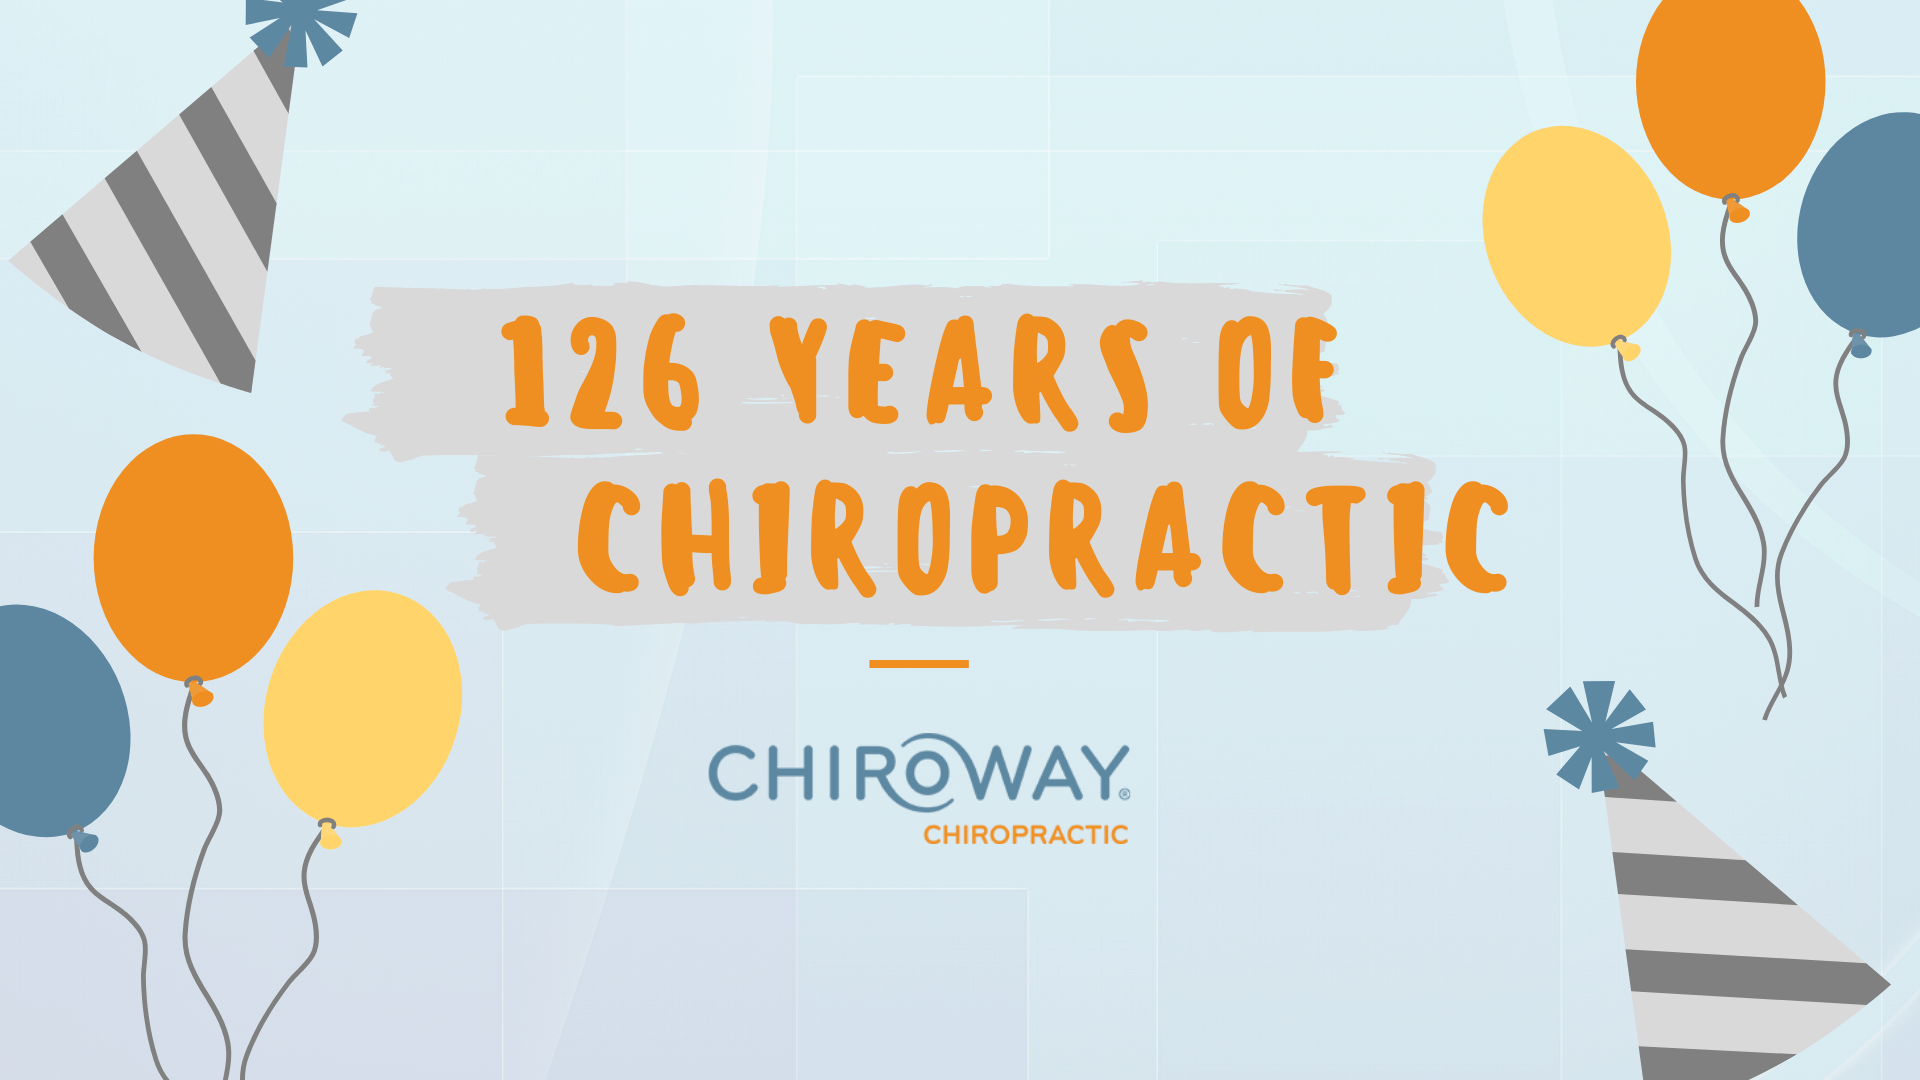 126 Years of Chiropractic